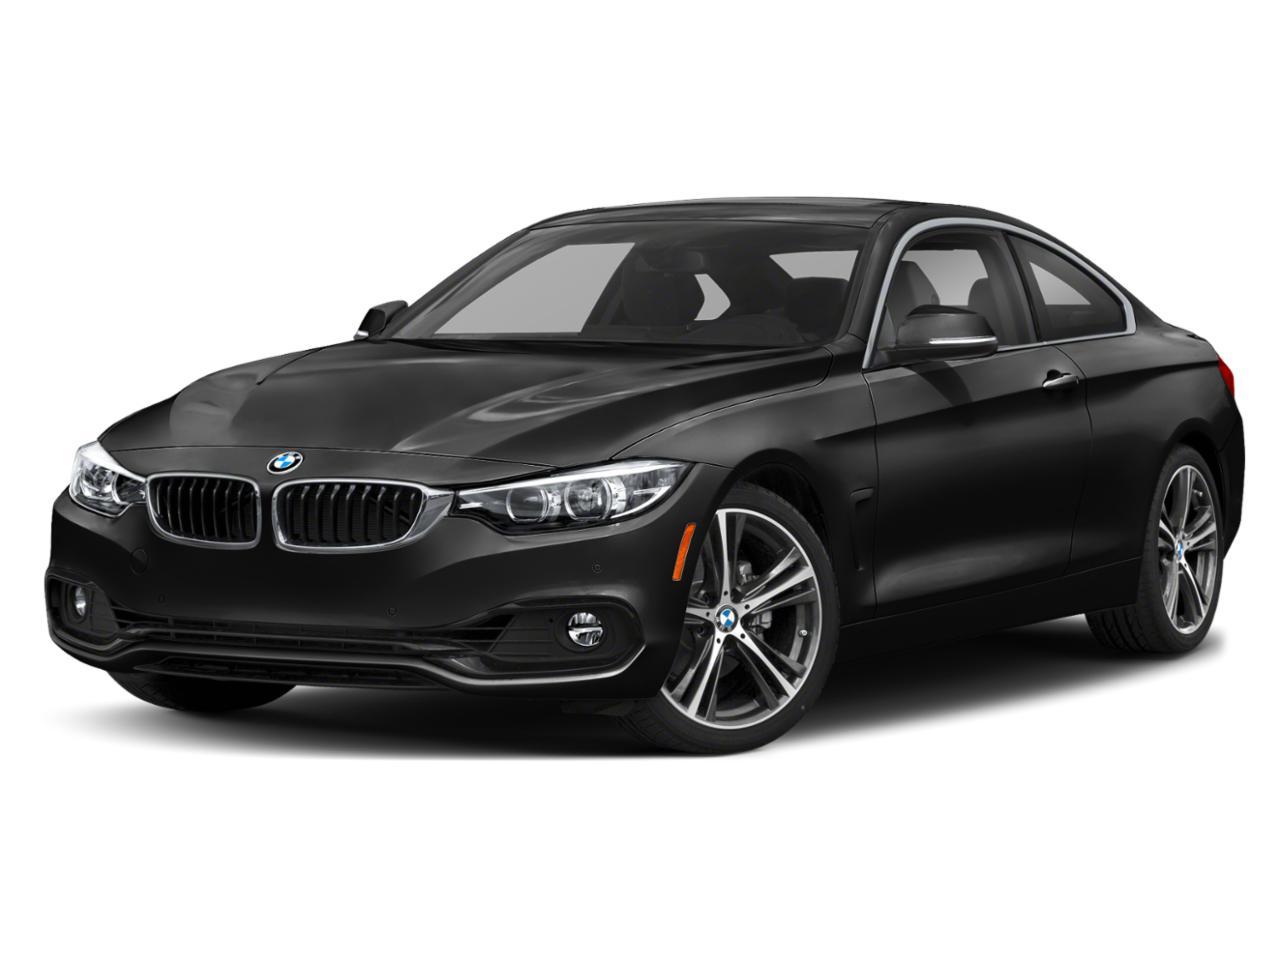 2020 BMW 430i Vehicle Photo in Charleston, SC 29407